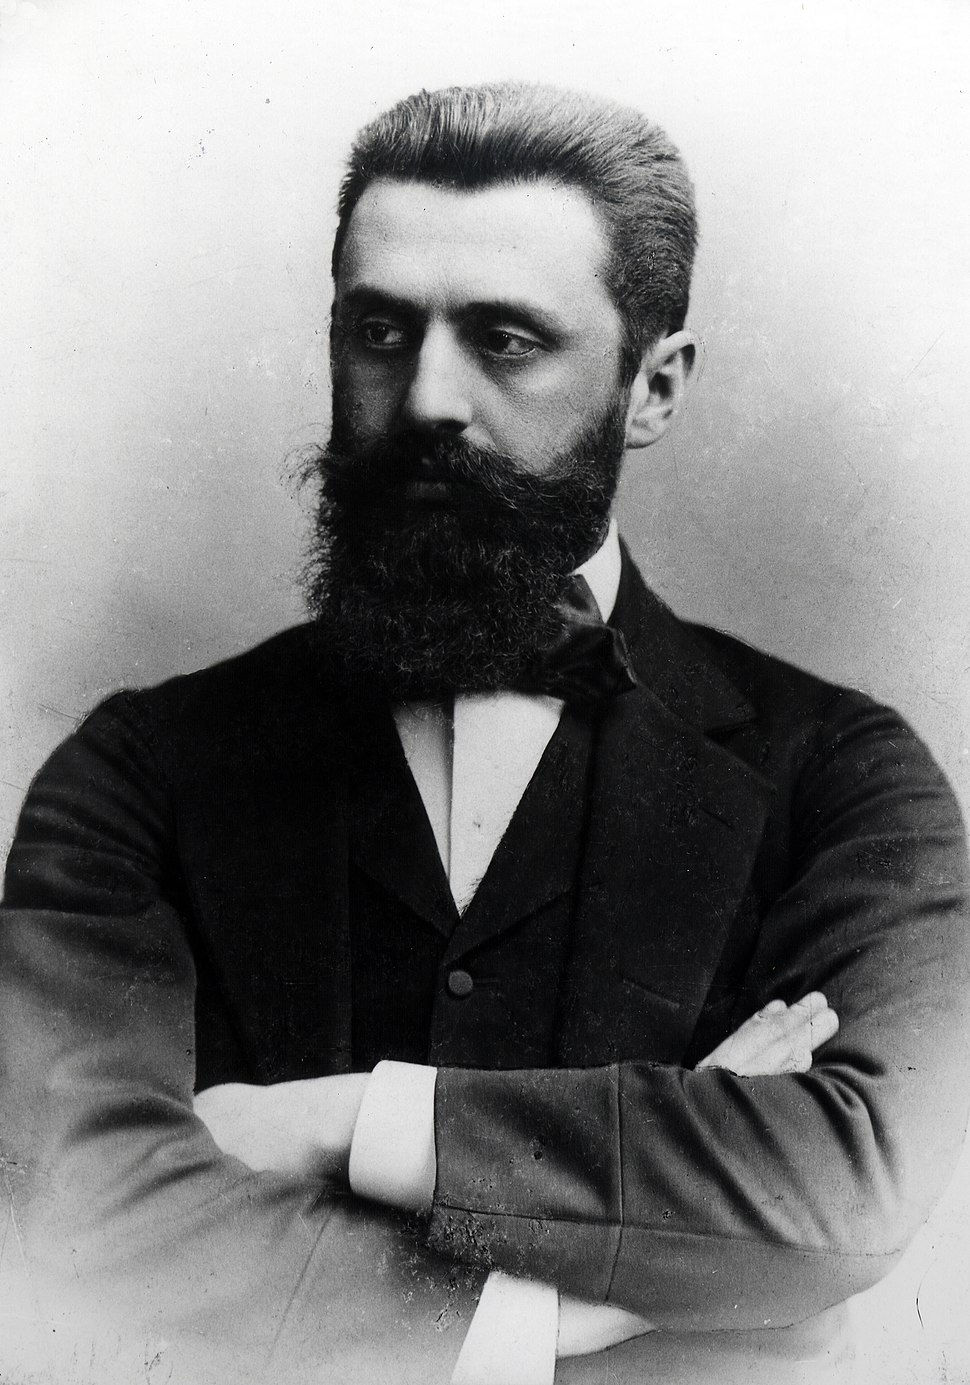 PORTRAIT OF THEODOR HERZL IN 1898. פורטרט של תיאודור הרצל - 1898D443-015